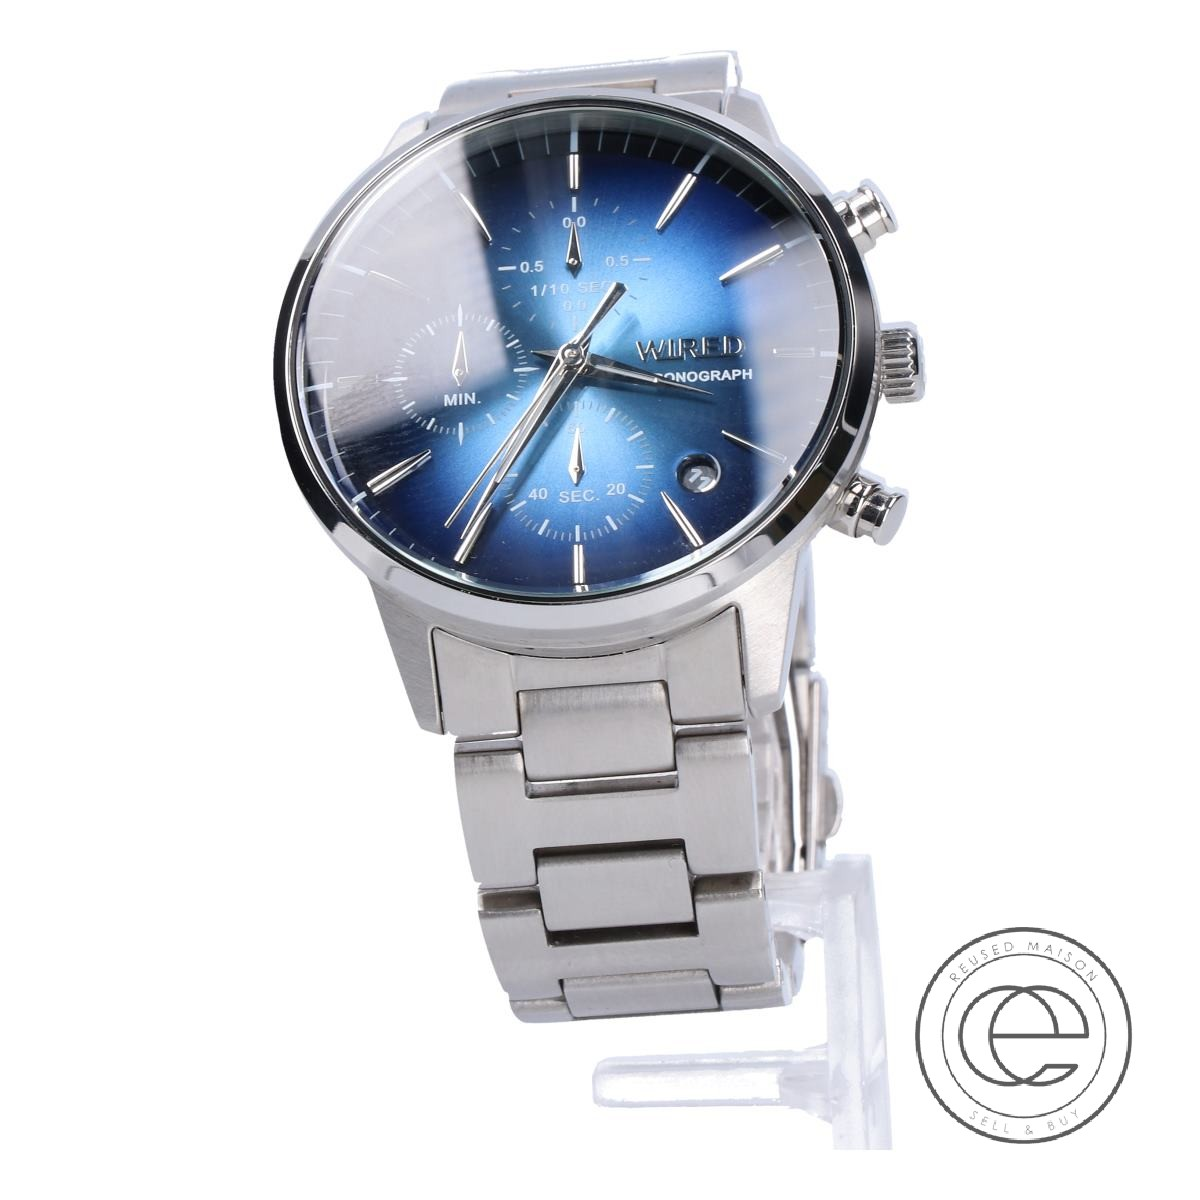 SEIKOセイコー AGAT419 VD57 WIRED TOKYO SORA クロノグラフ クオーツ腕時計 シルバー/ブルー メンズ 【中古】